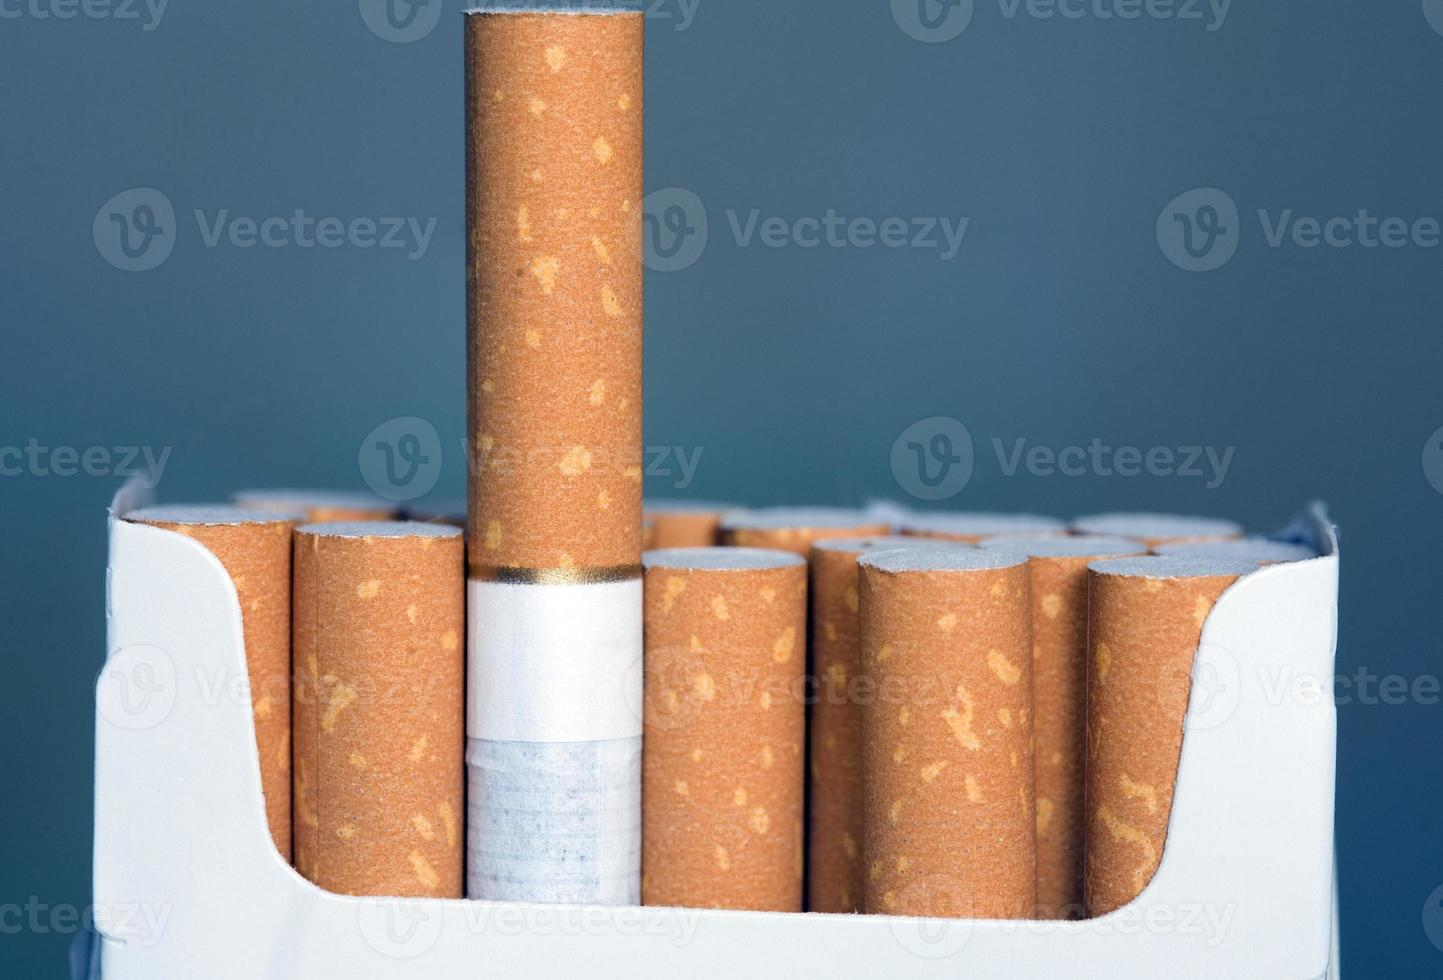 maço de cigarros com filtros close-up foto